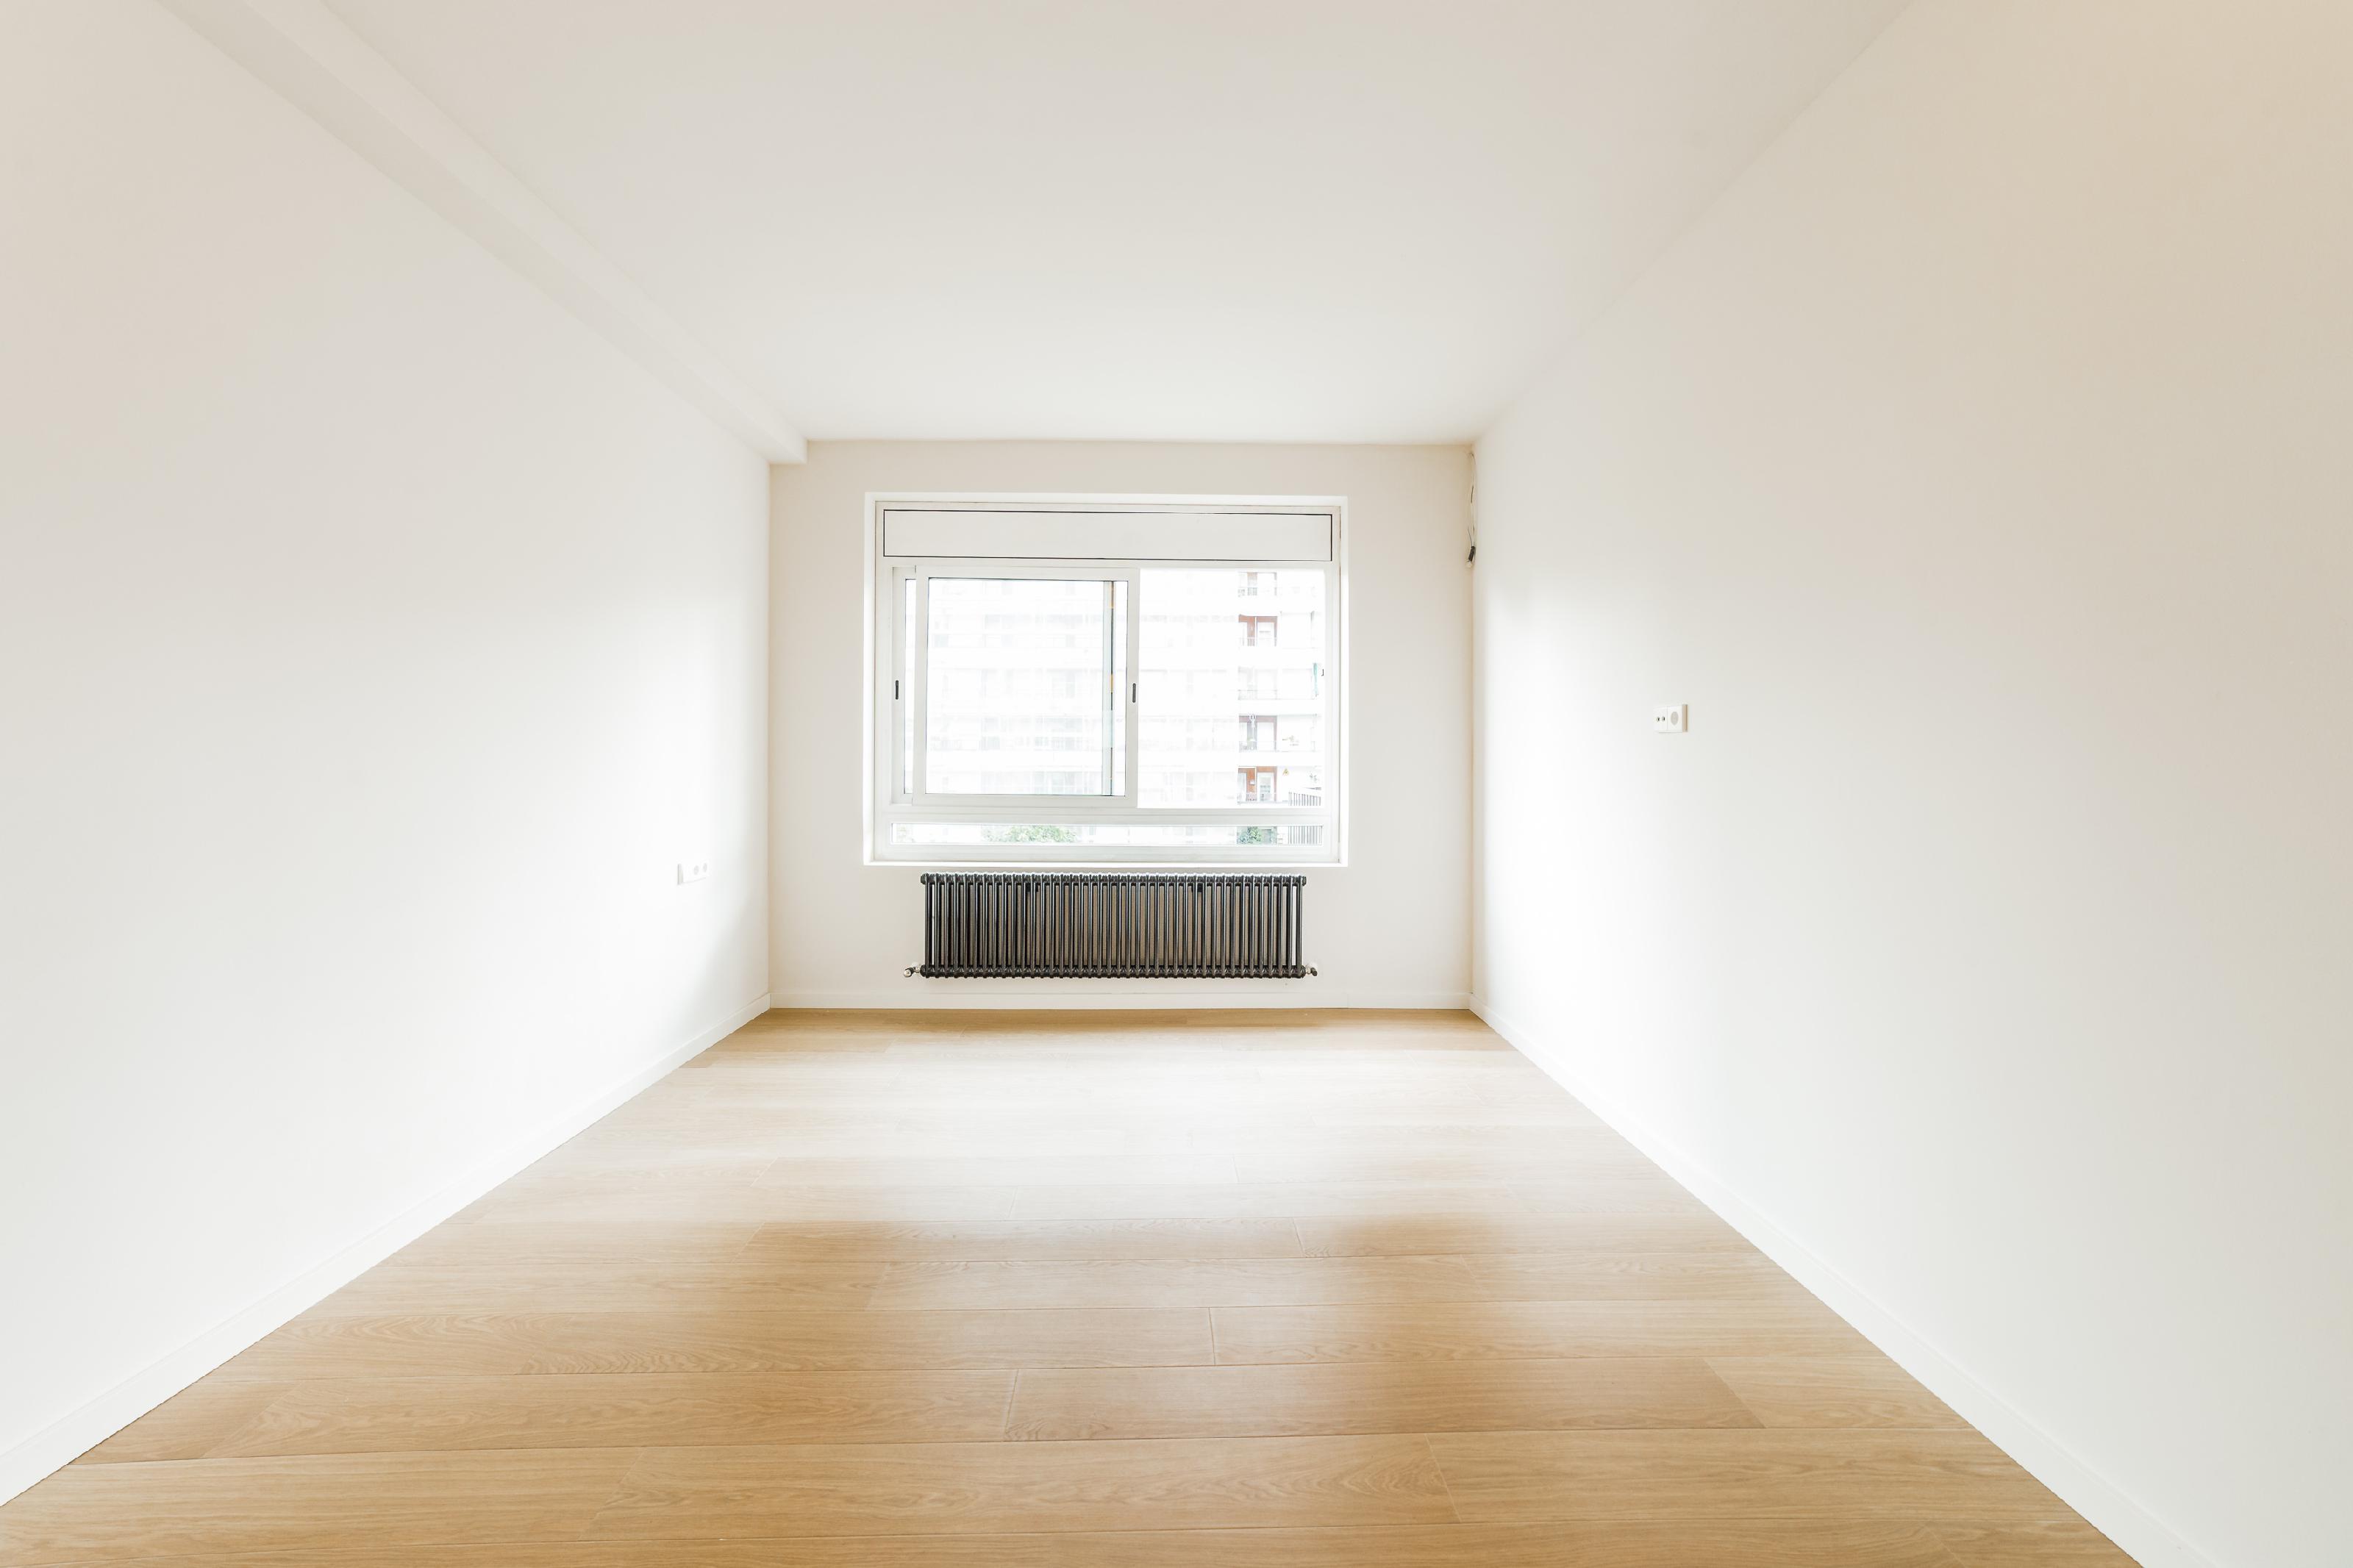 253492 Flat for sale in Sarrià-Sant Gervasi, Sant Gervasi-Galvany 29